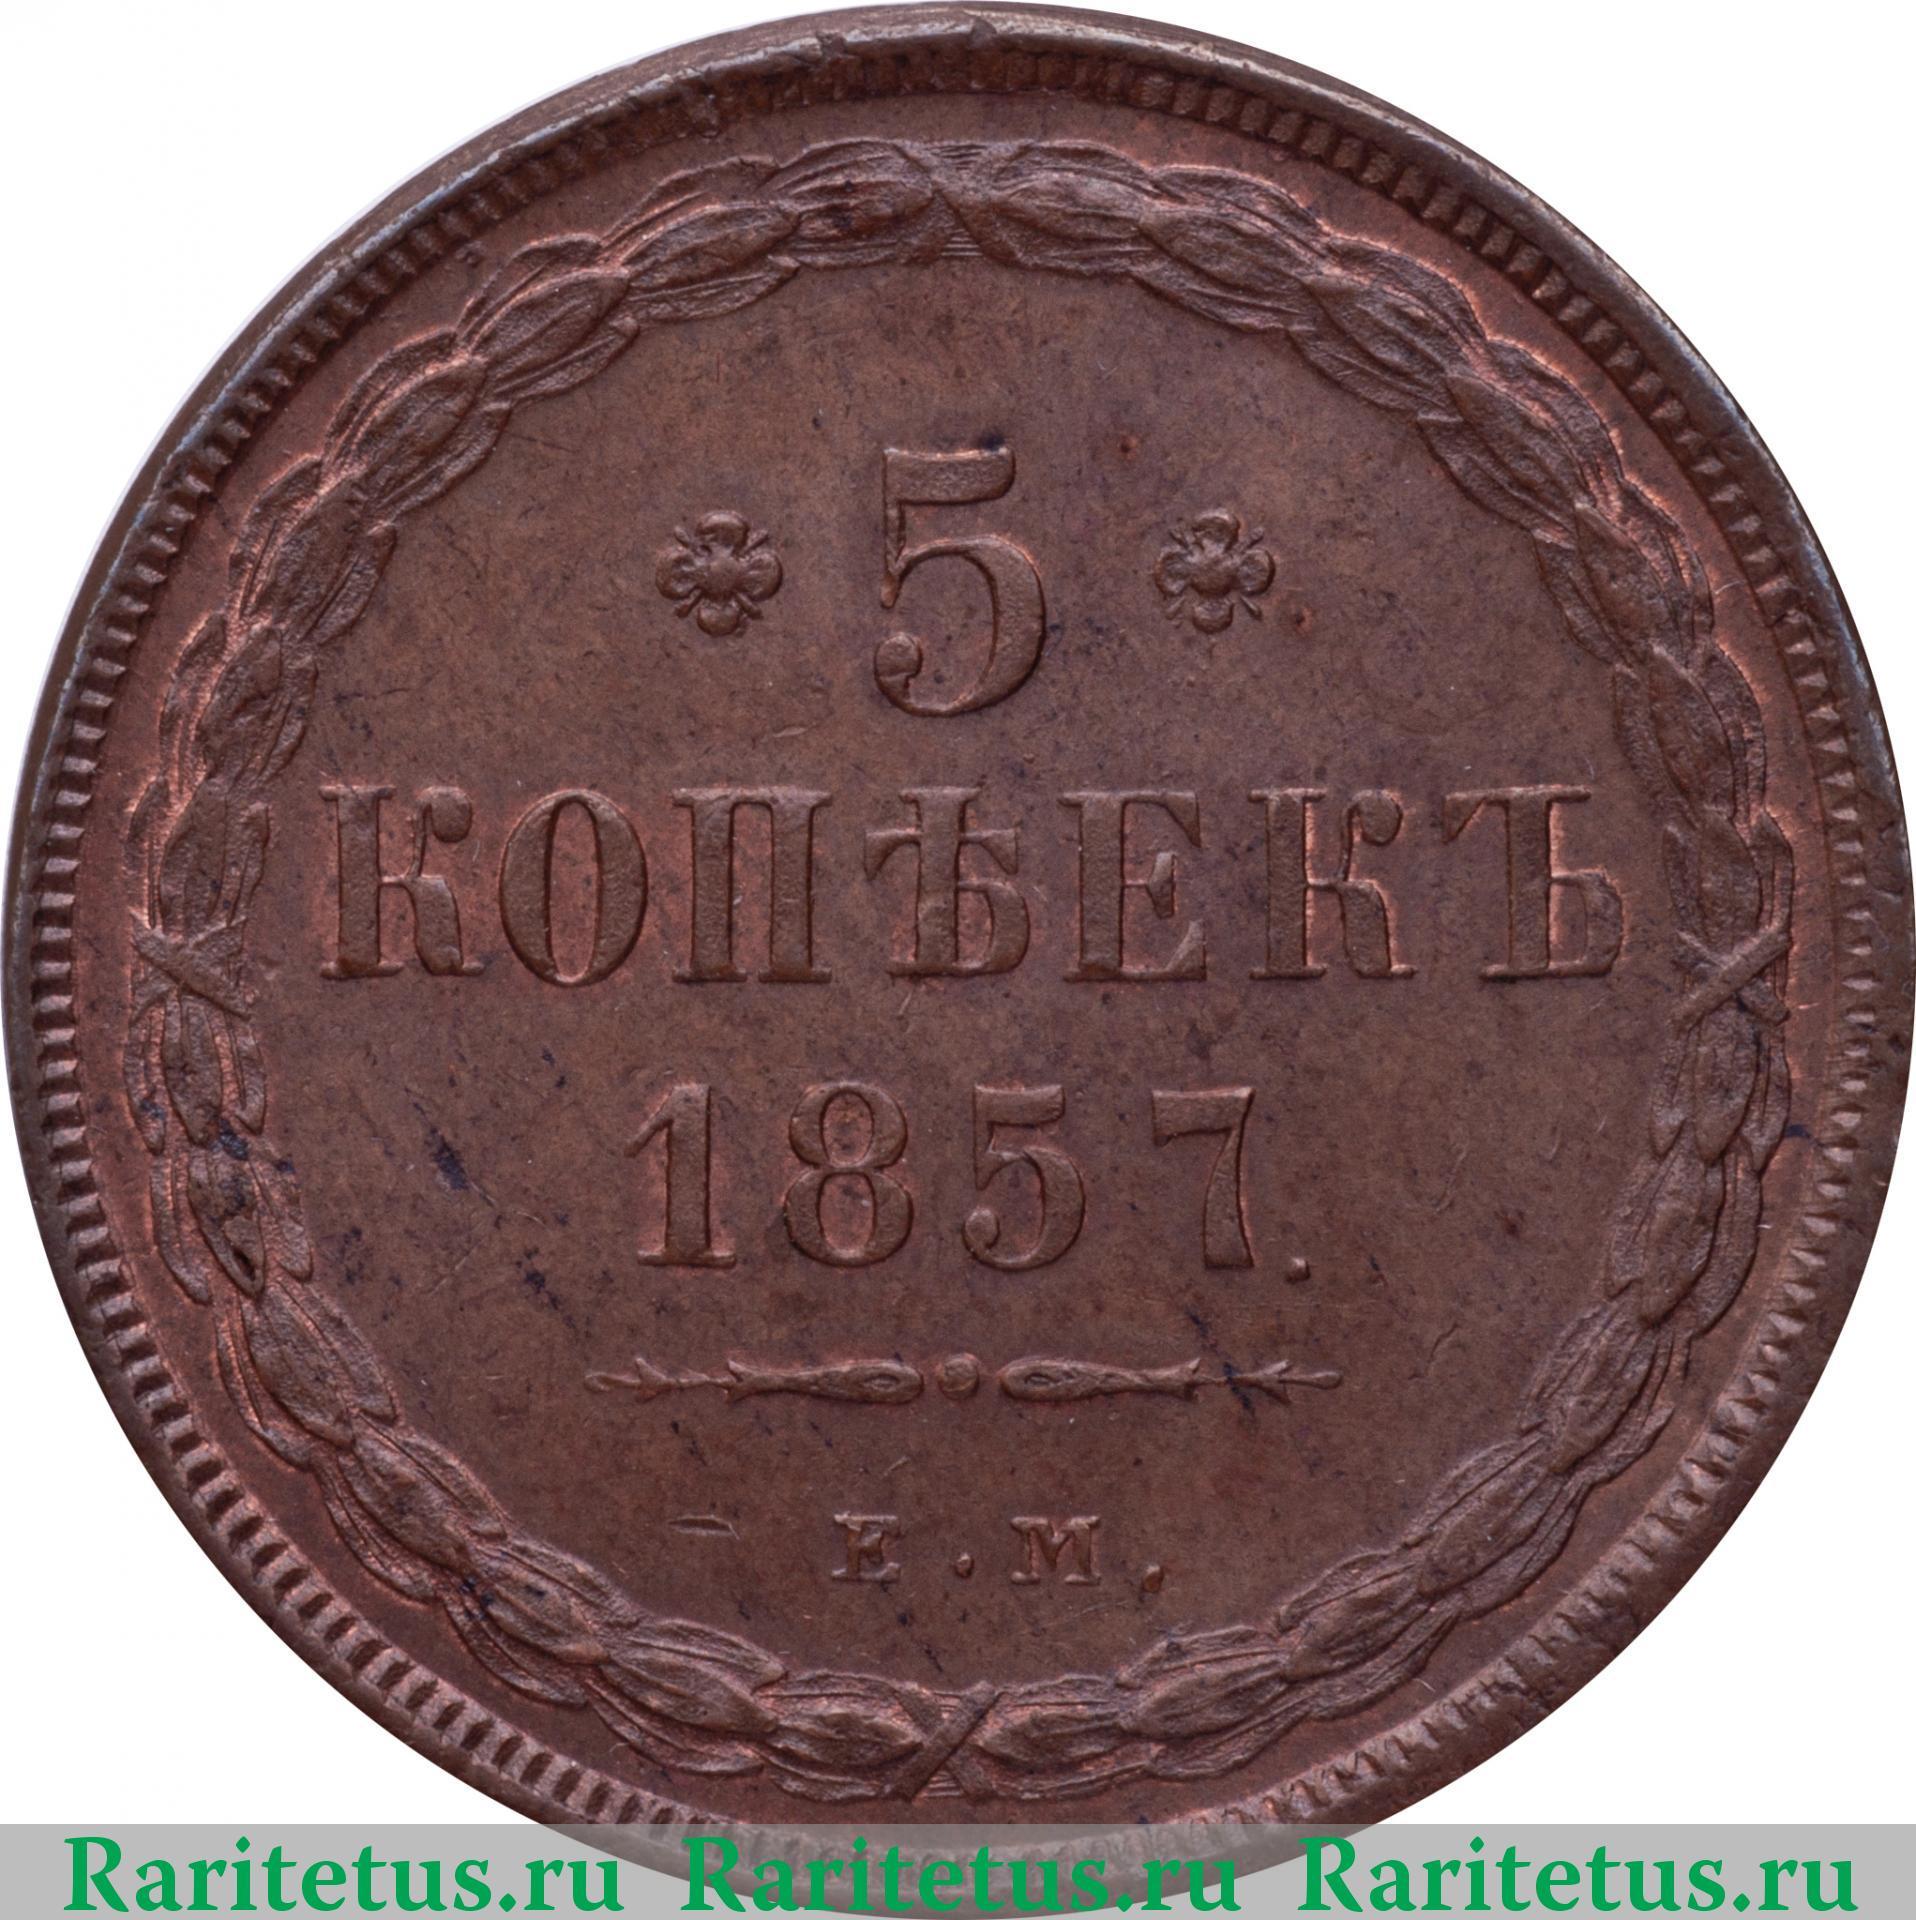 3 копейки 1857 года цена 5 копеек 1988 года цена в украине